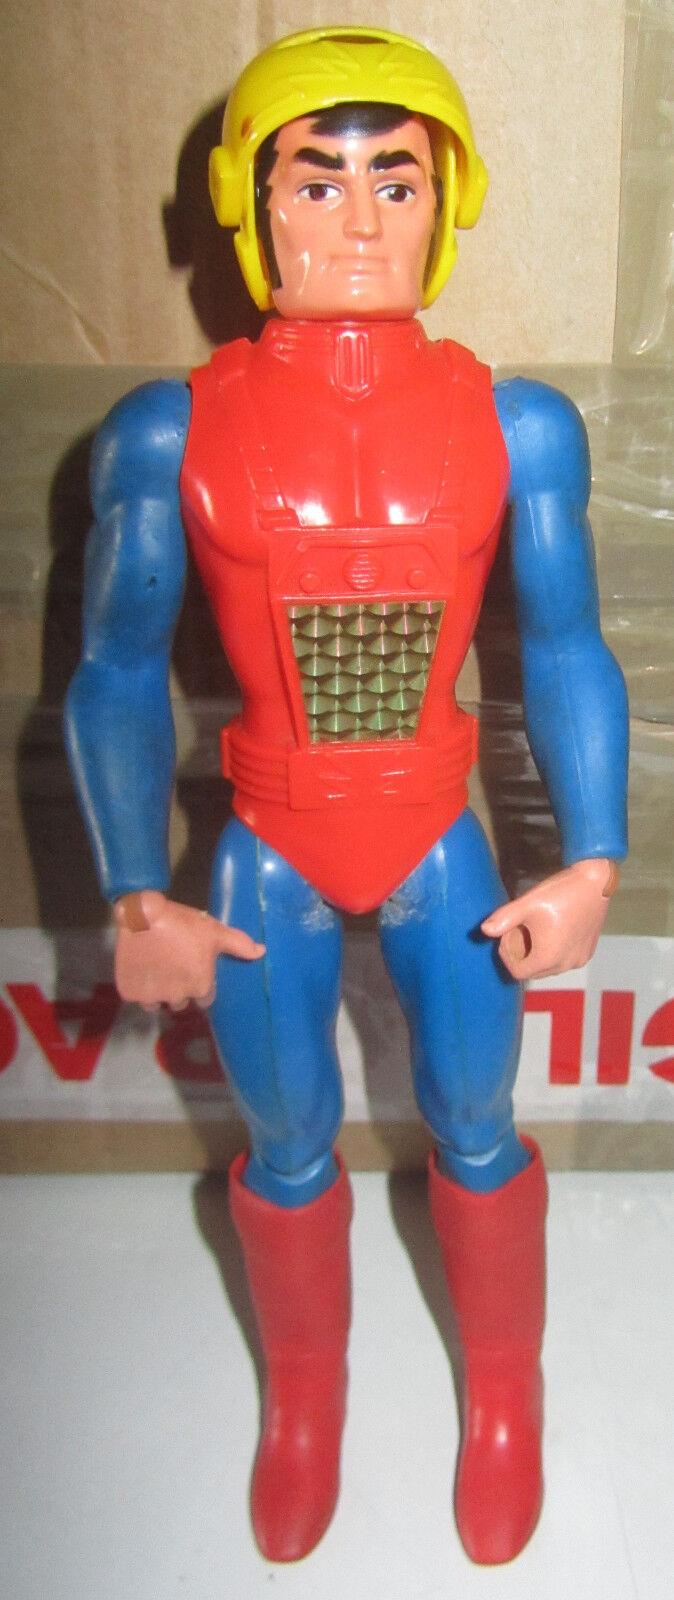 Big Jim Captain Laser Capitan 3264 rigido Mattel SPESE GRATIS